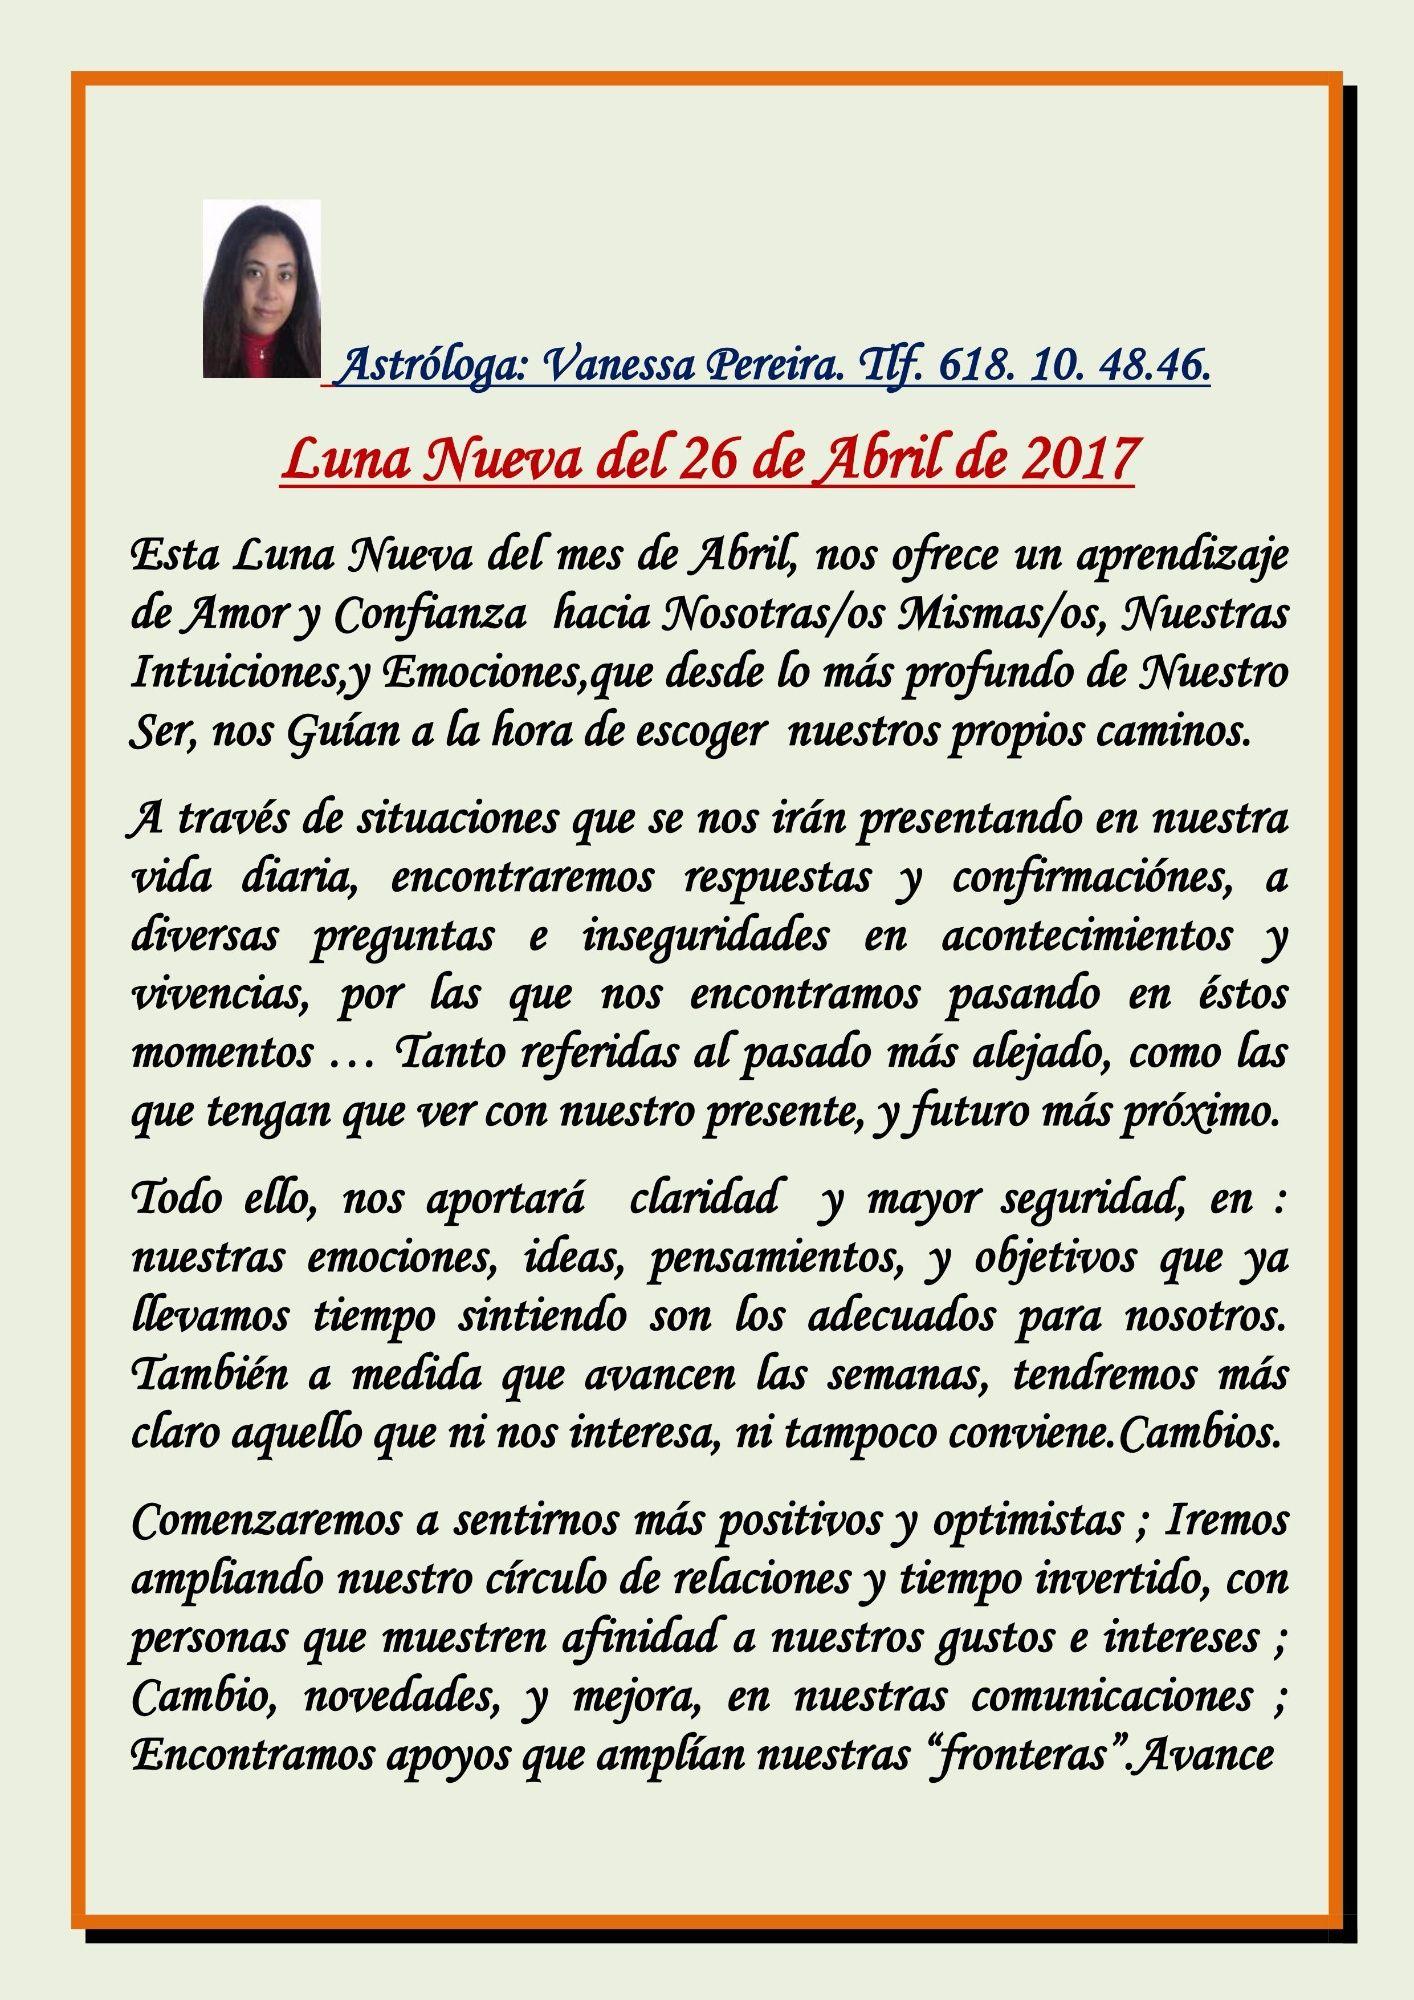 Astróloga Vanessa Pereira.  LUNA NUEVA DEL 26 DE ABRIL 2017